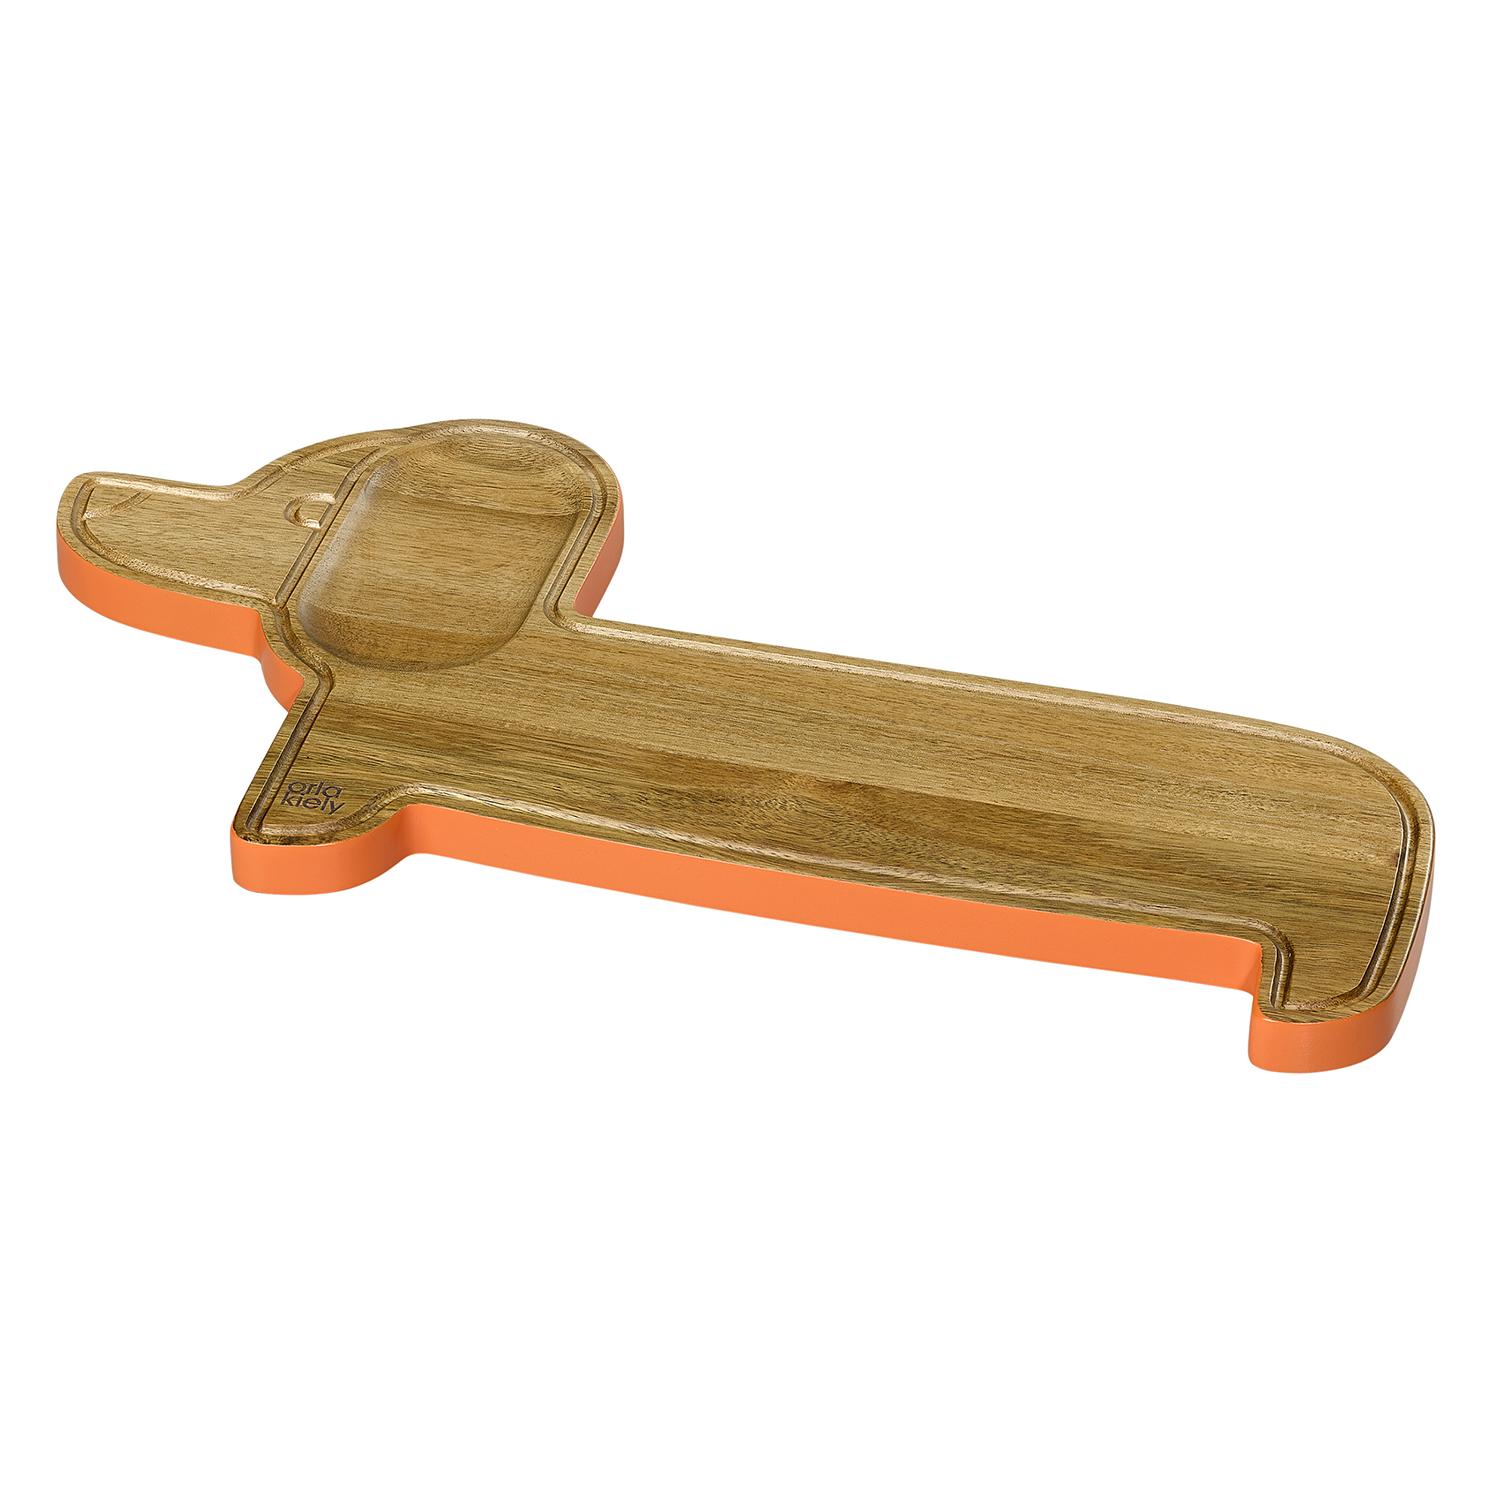 Orla Kiely – Wooden Dachshund Persimmon Serving Board